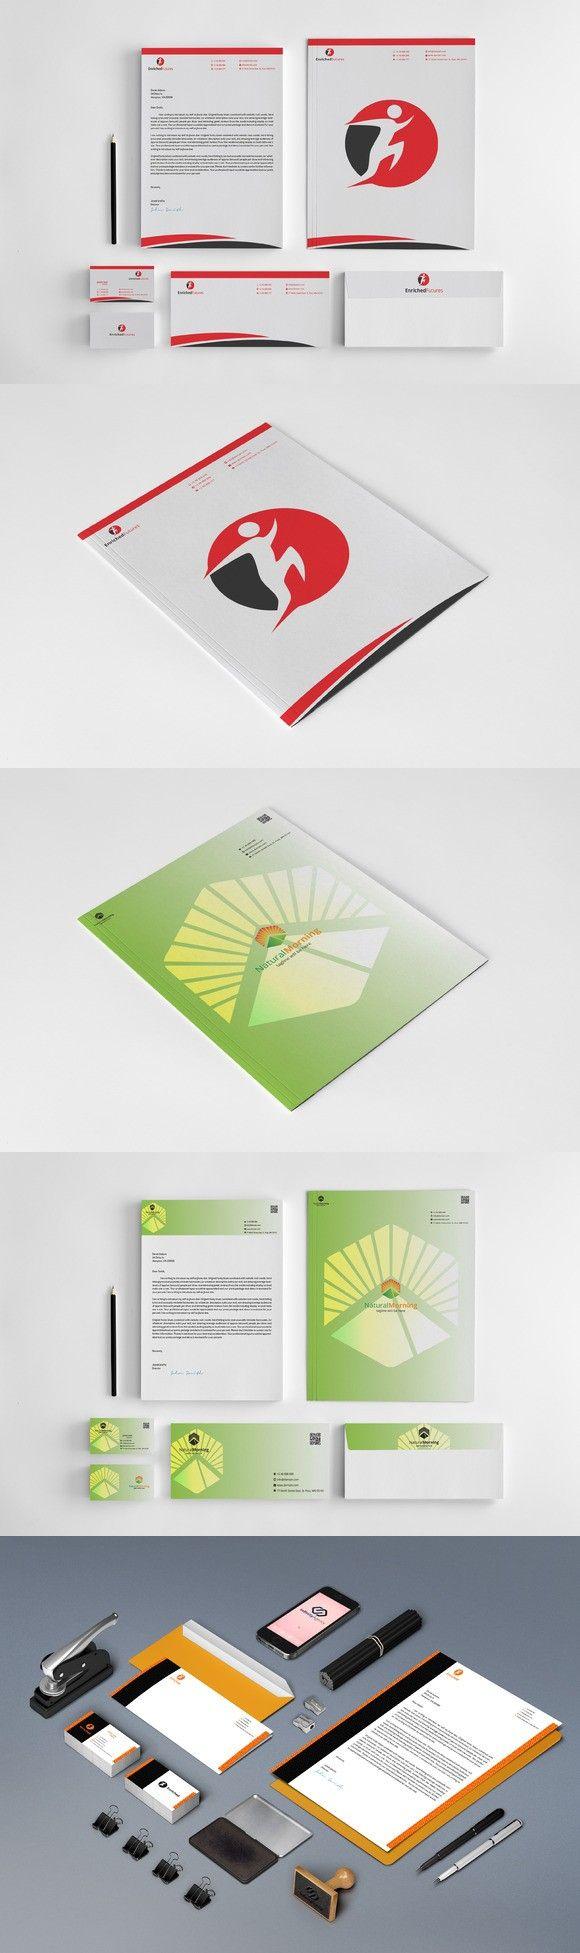 Creative Stationery Bundle. Stationery Templates